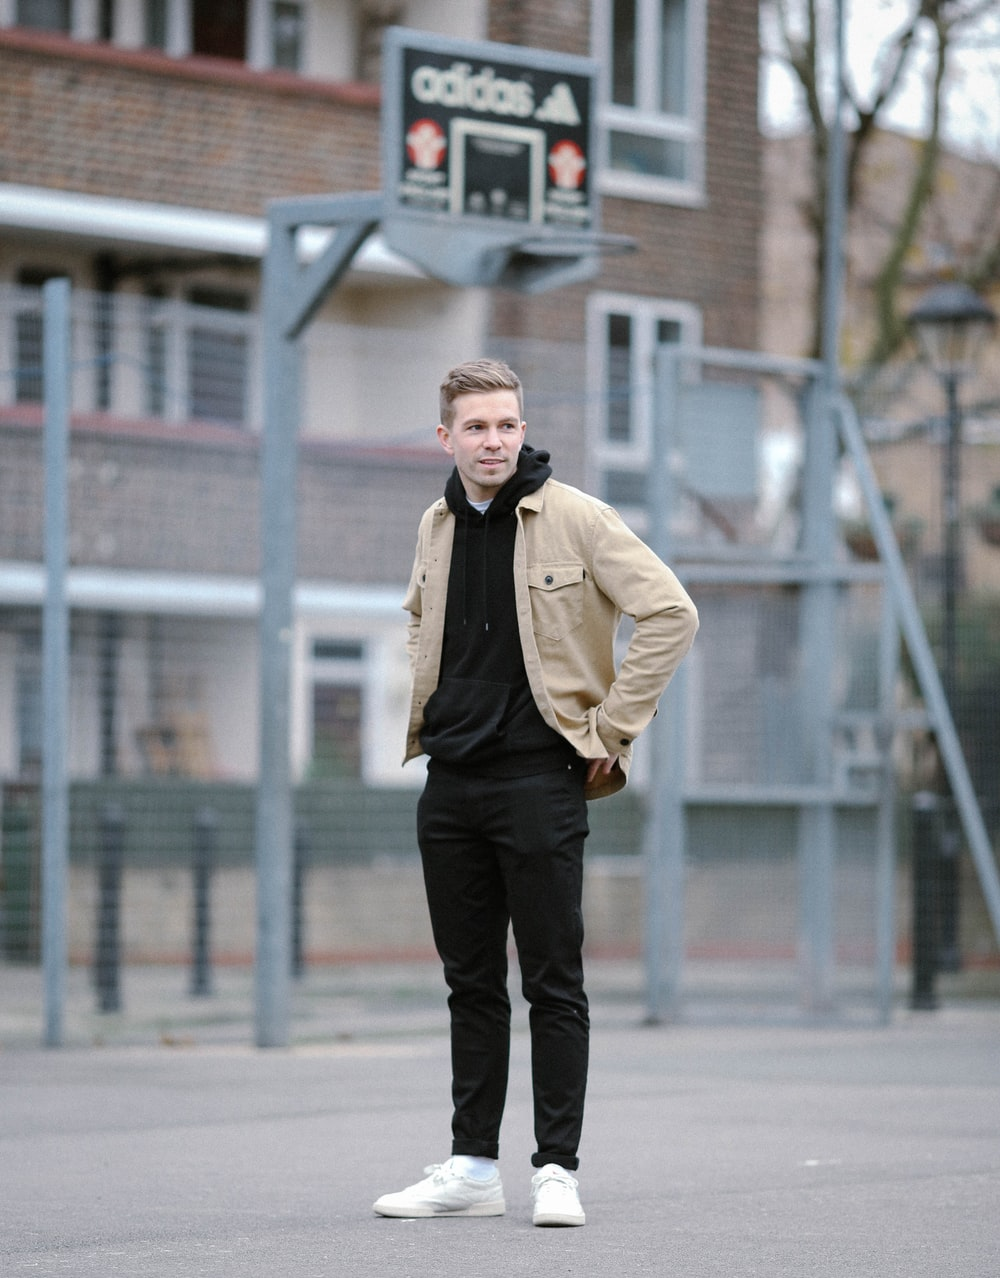 man wearing brown jacket and black pants standing near basketball ring